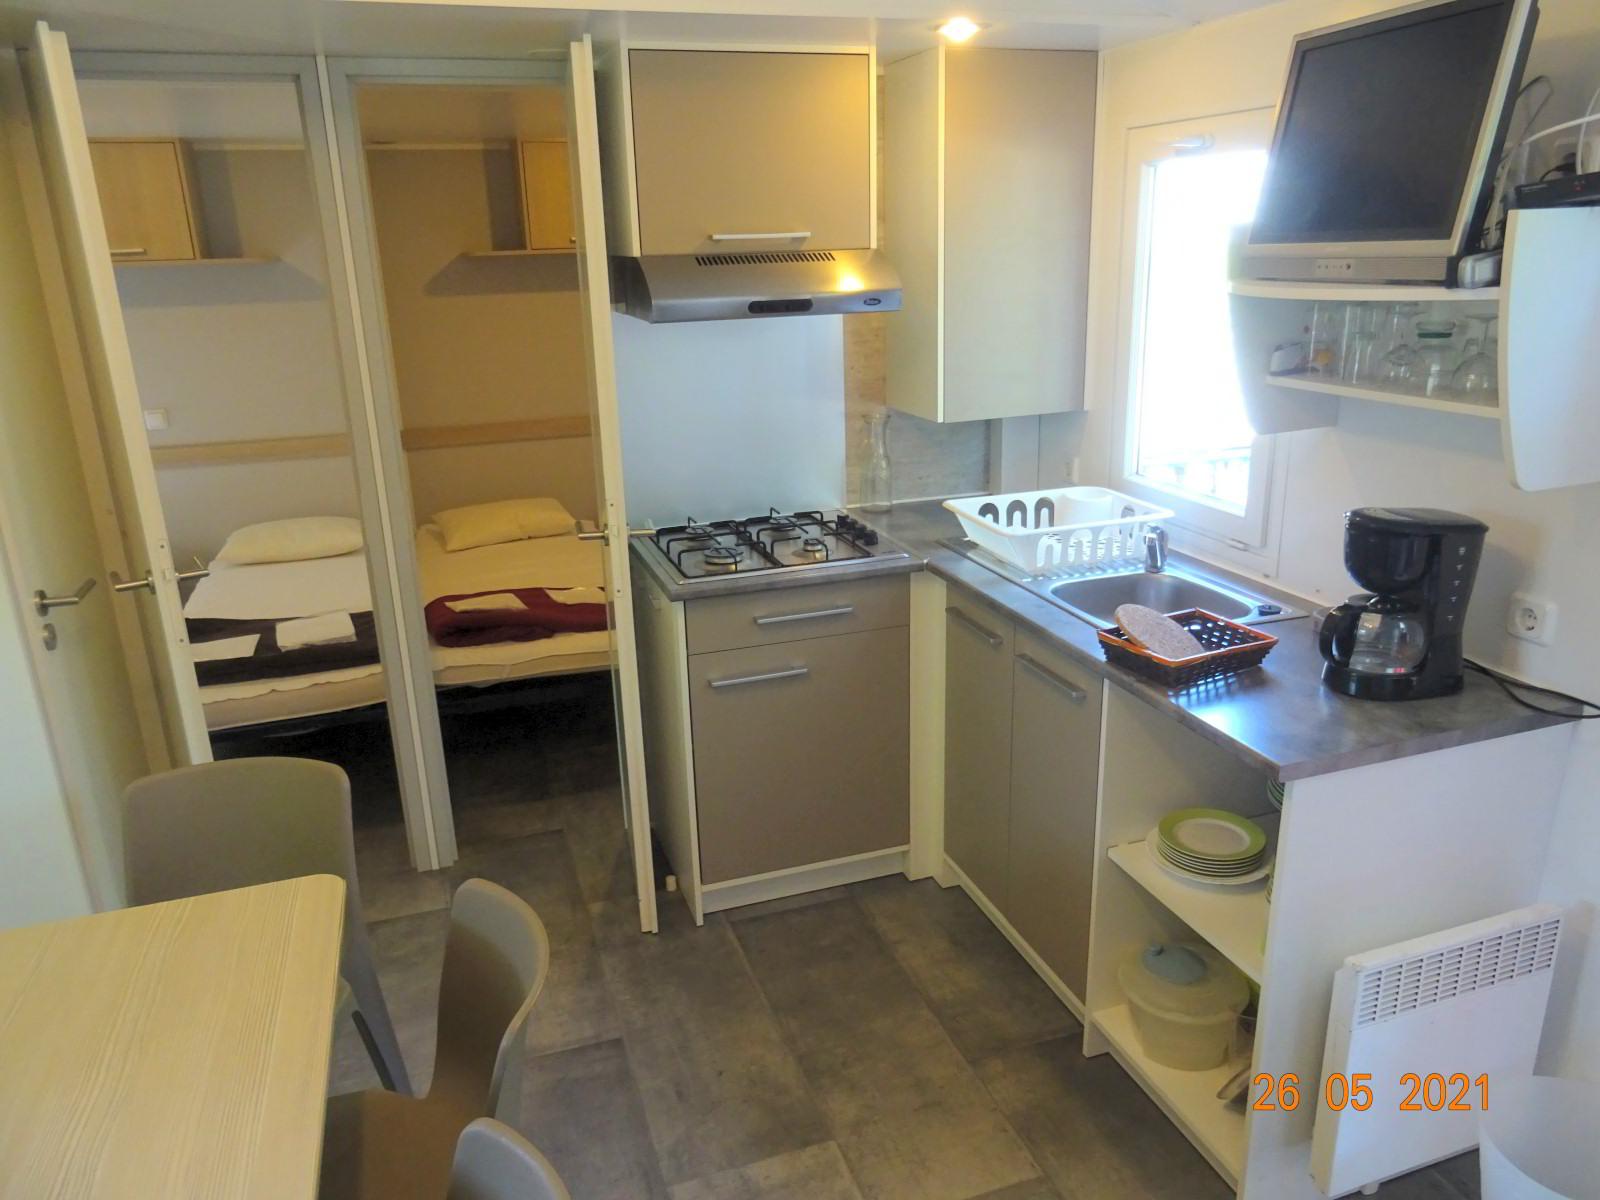 Cuisine et chambres, mobil-home 3 chambres